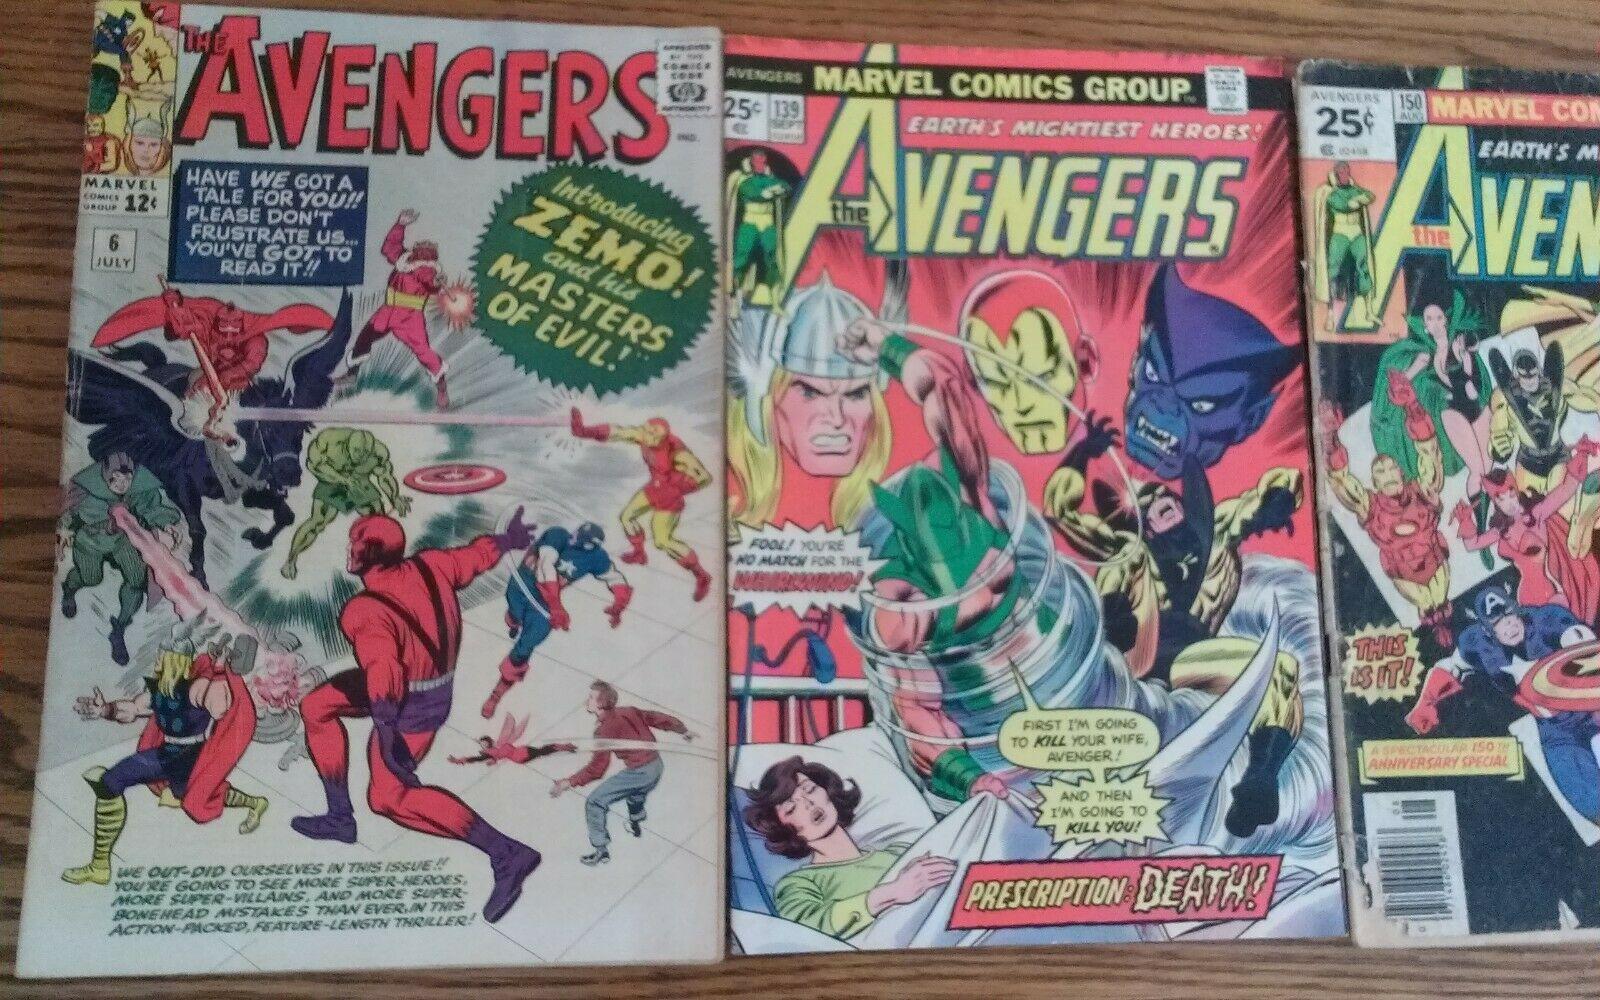 The AVENGERS 1964 number 6 comic & AVENGERS 139 and AVENGERS 150 comic rare ZEMO